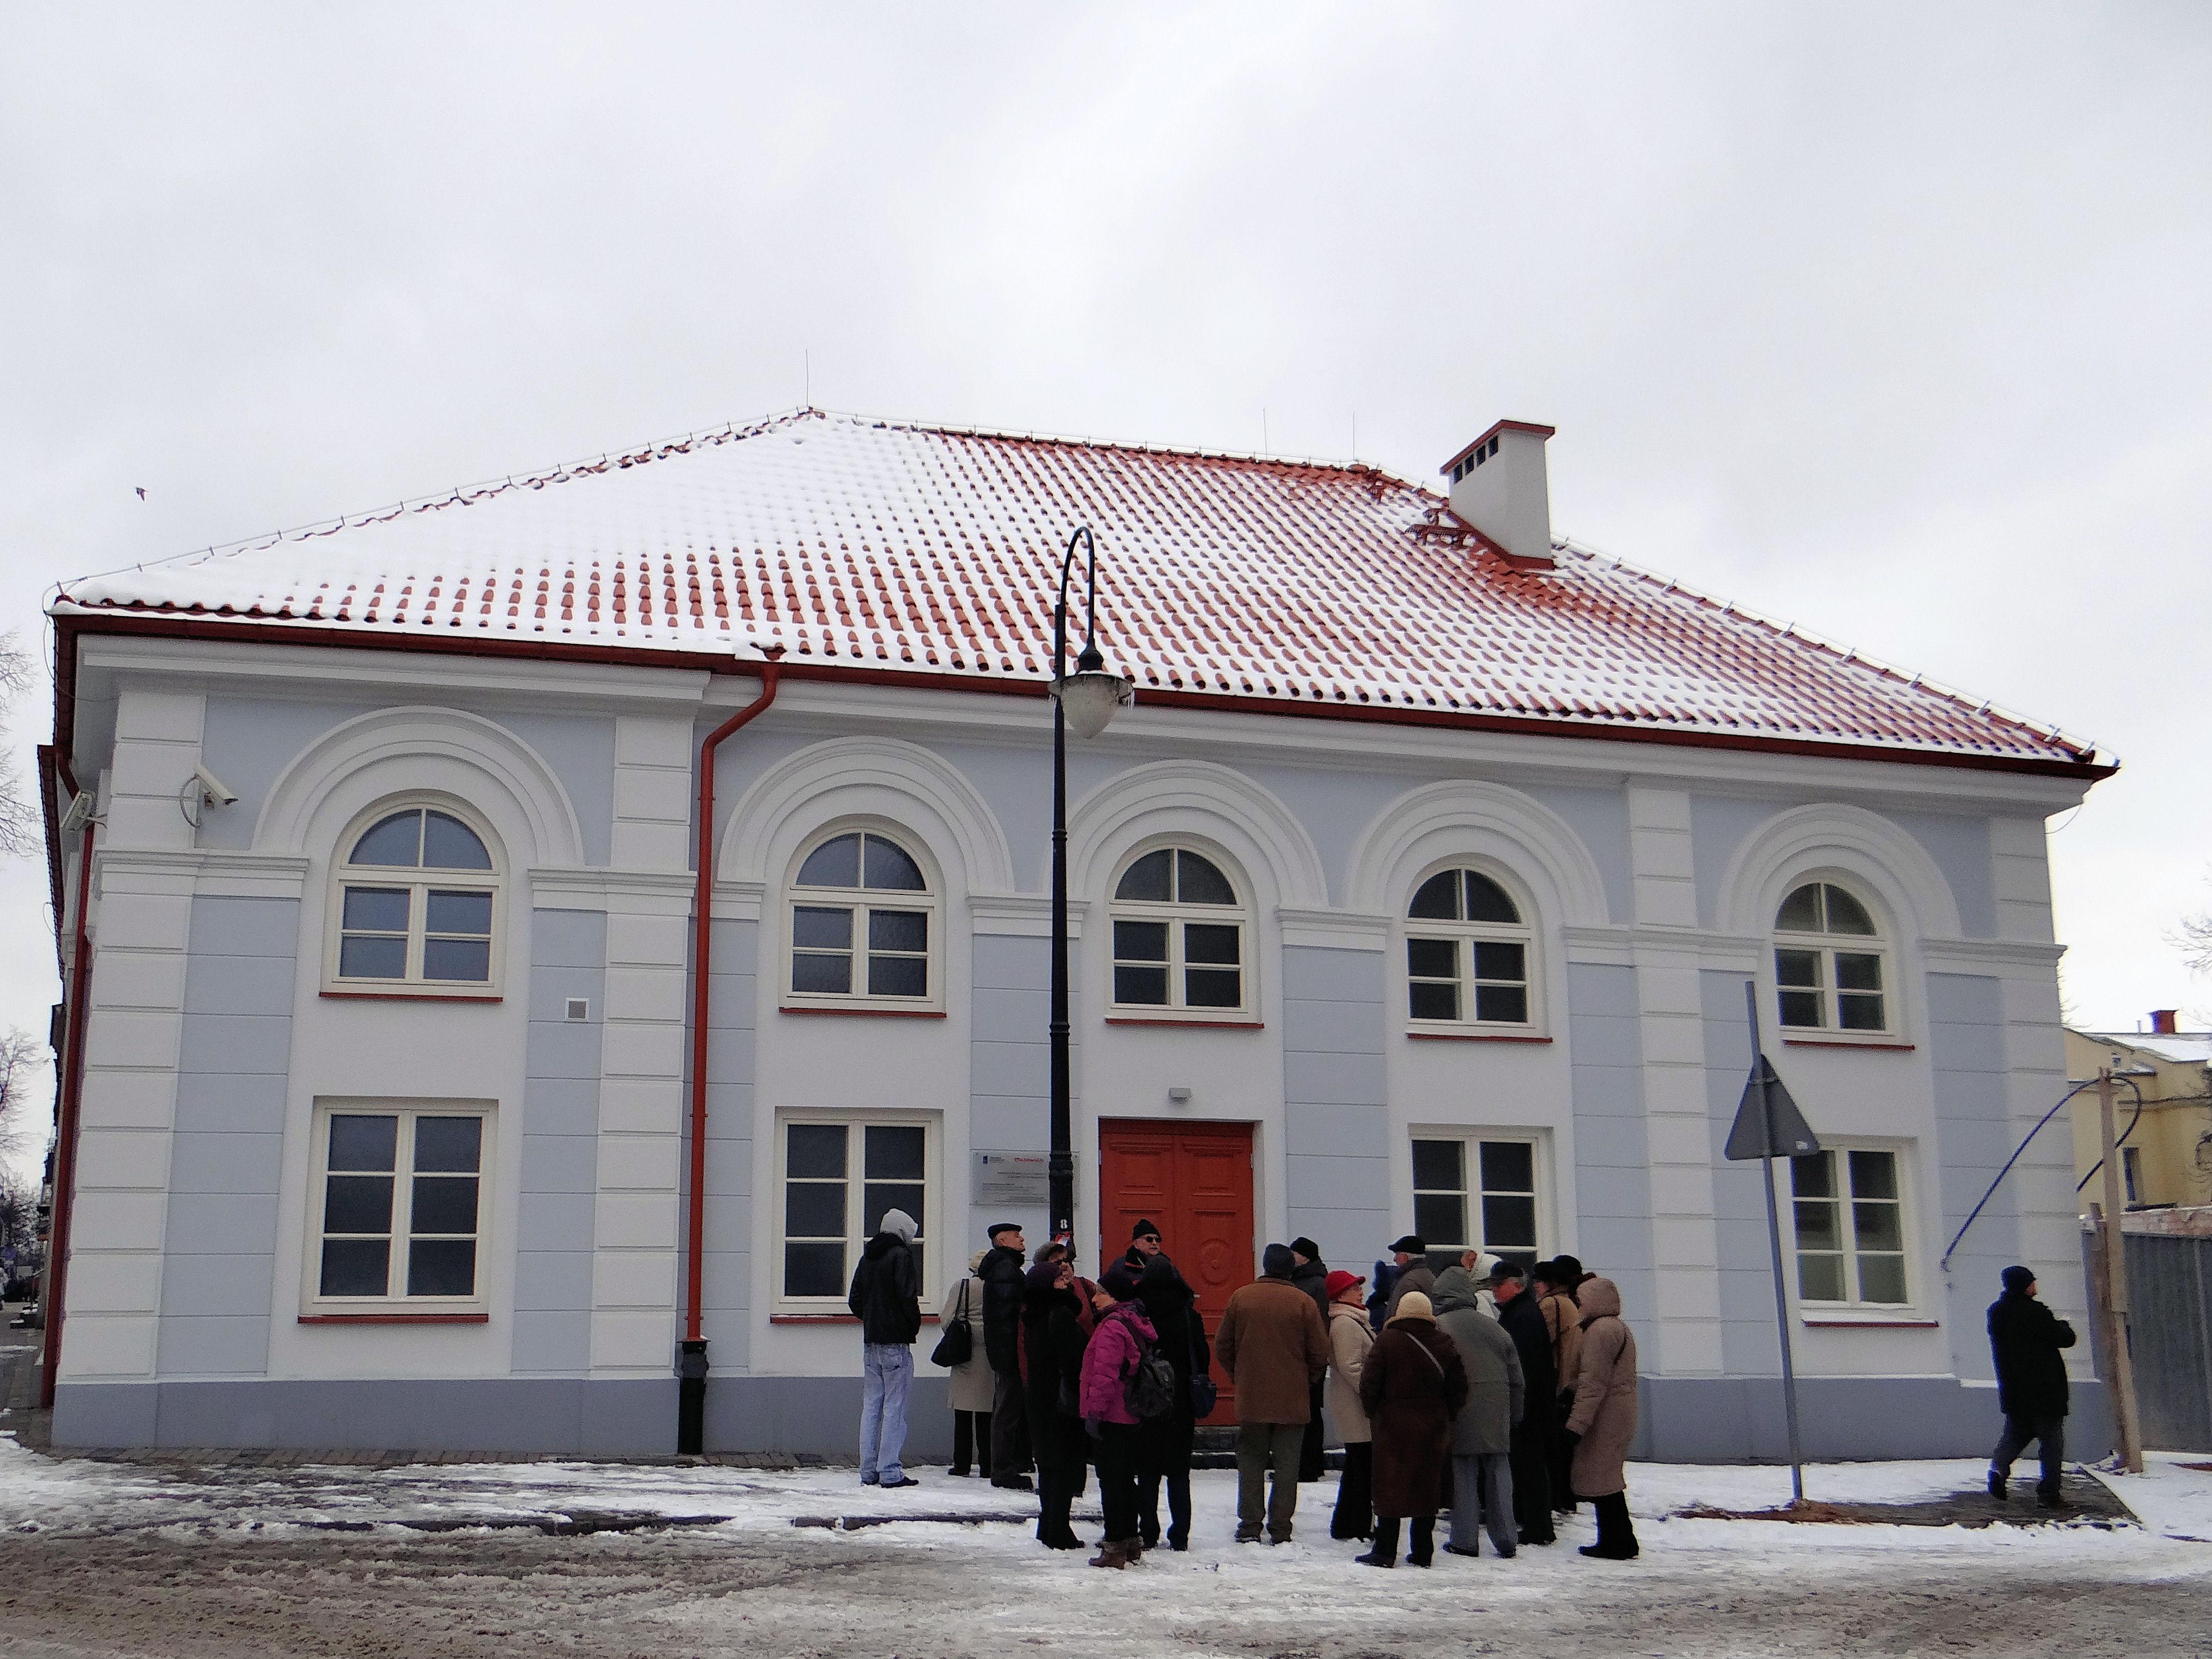 https://upload.wikimedia.org/wikipedia/commons/b/b4/2013_Small_Synagogue_in_P%C5%82ock_-_01.jpg